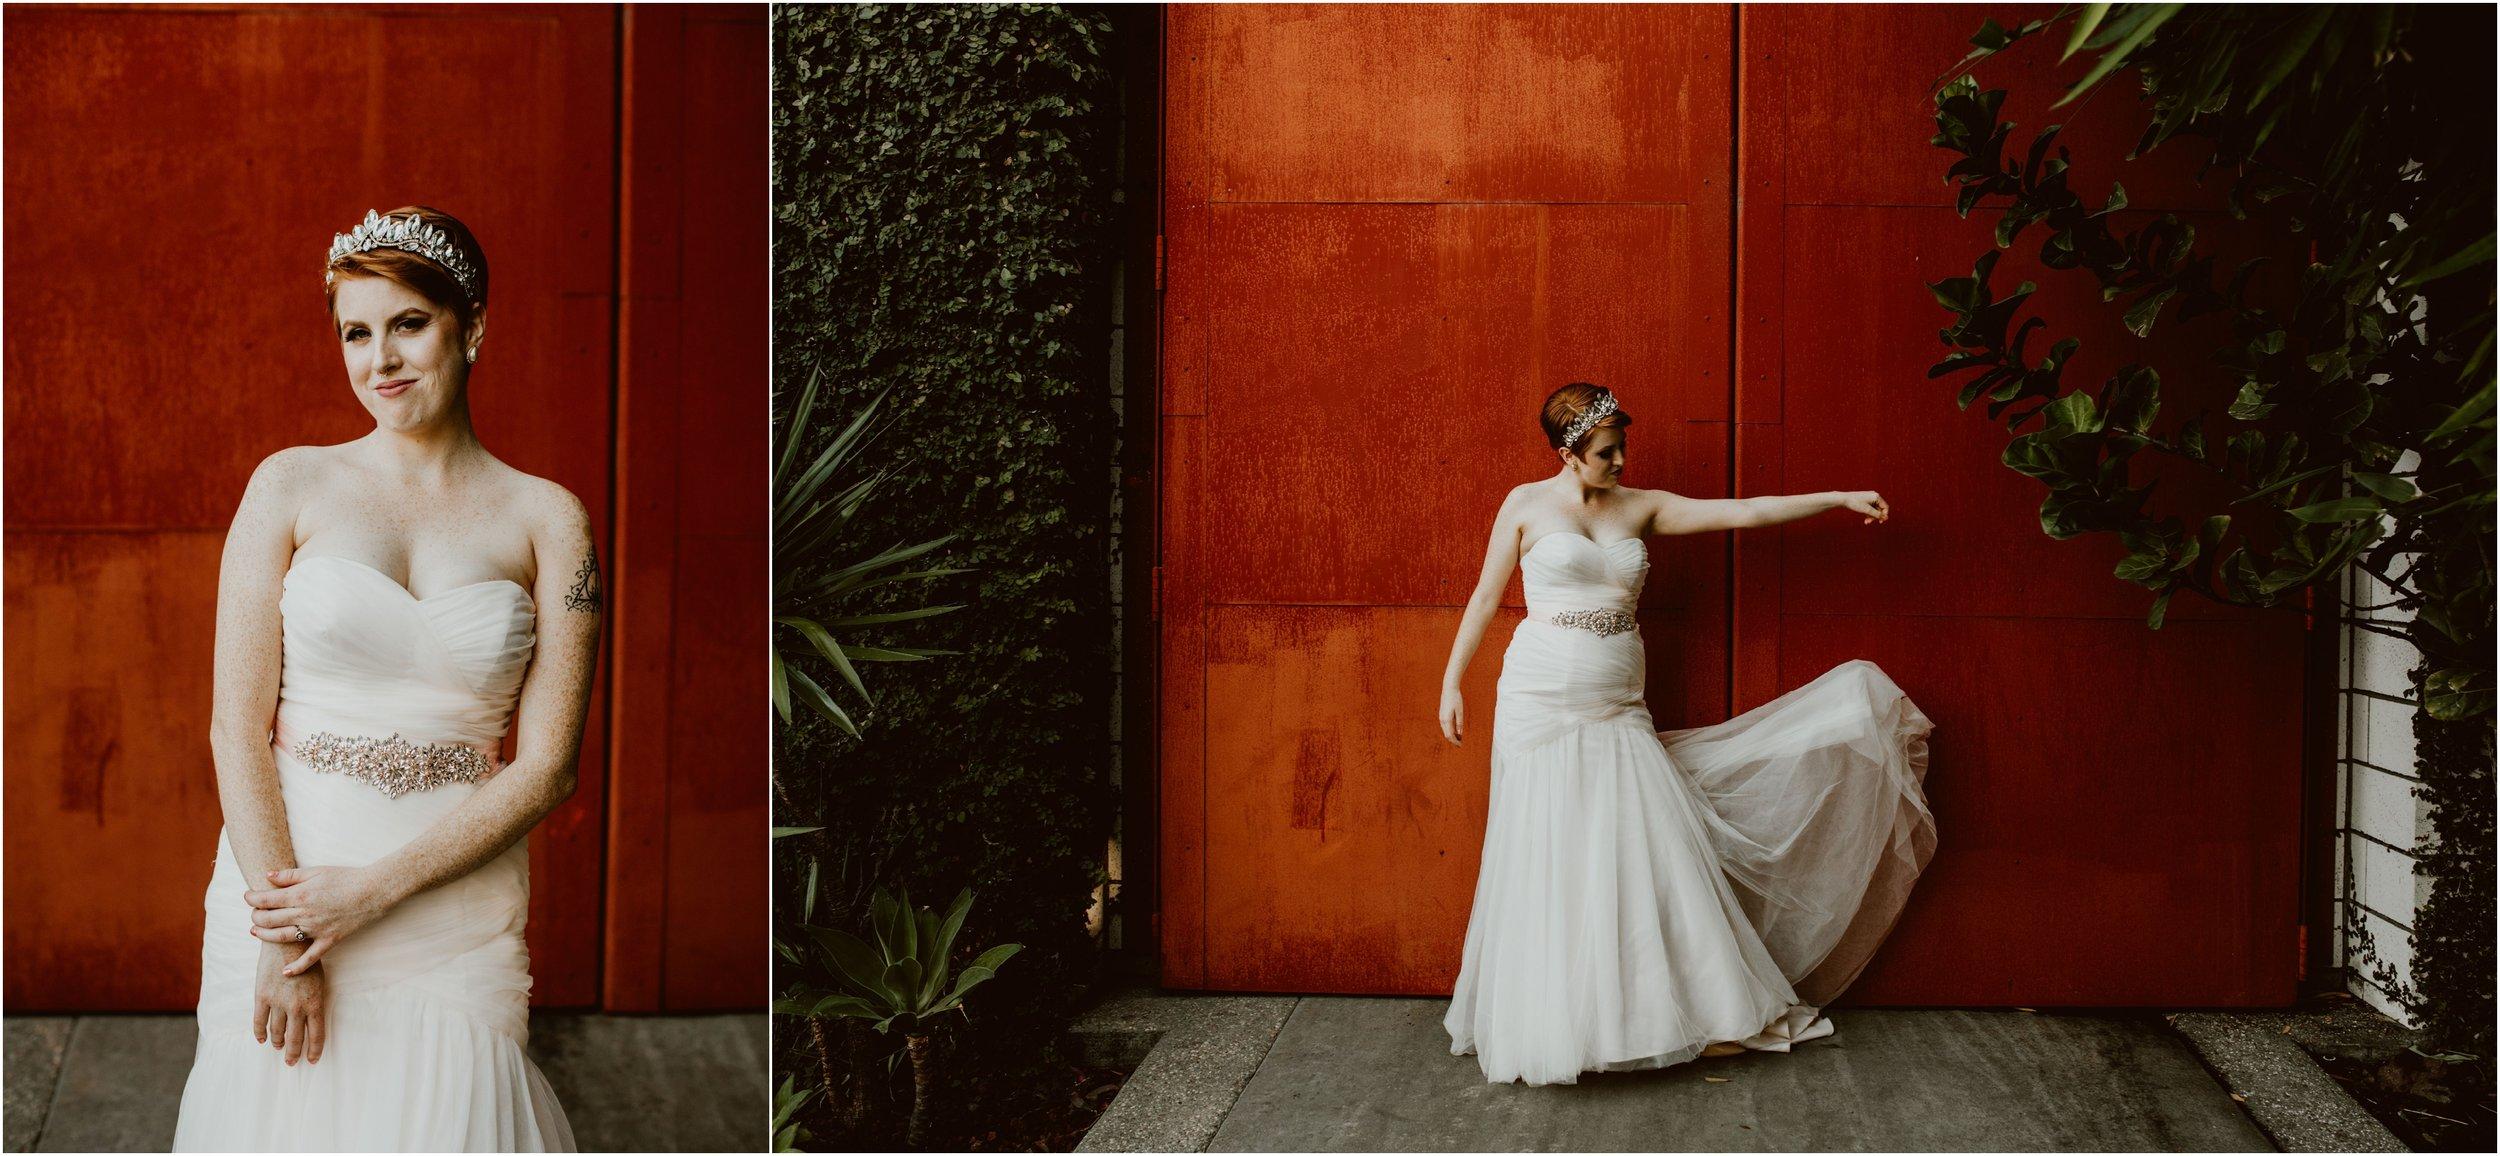 Smogshoppe-Wedding-S+C-Diana-Lake-Photography-711.jpg